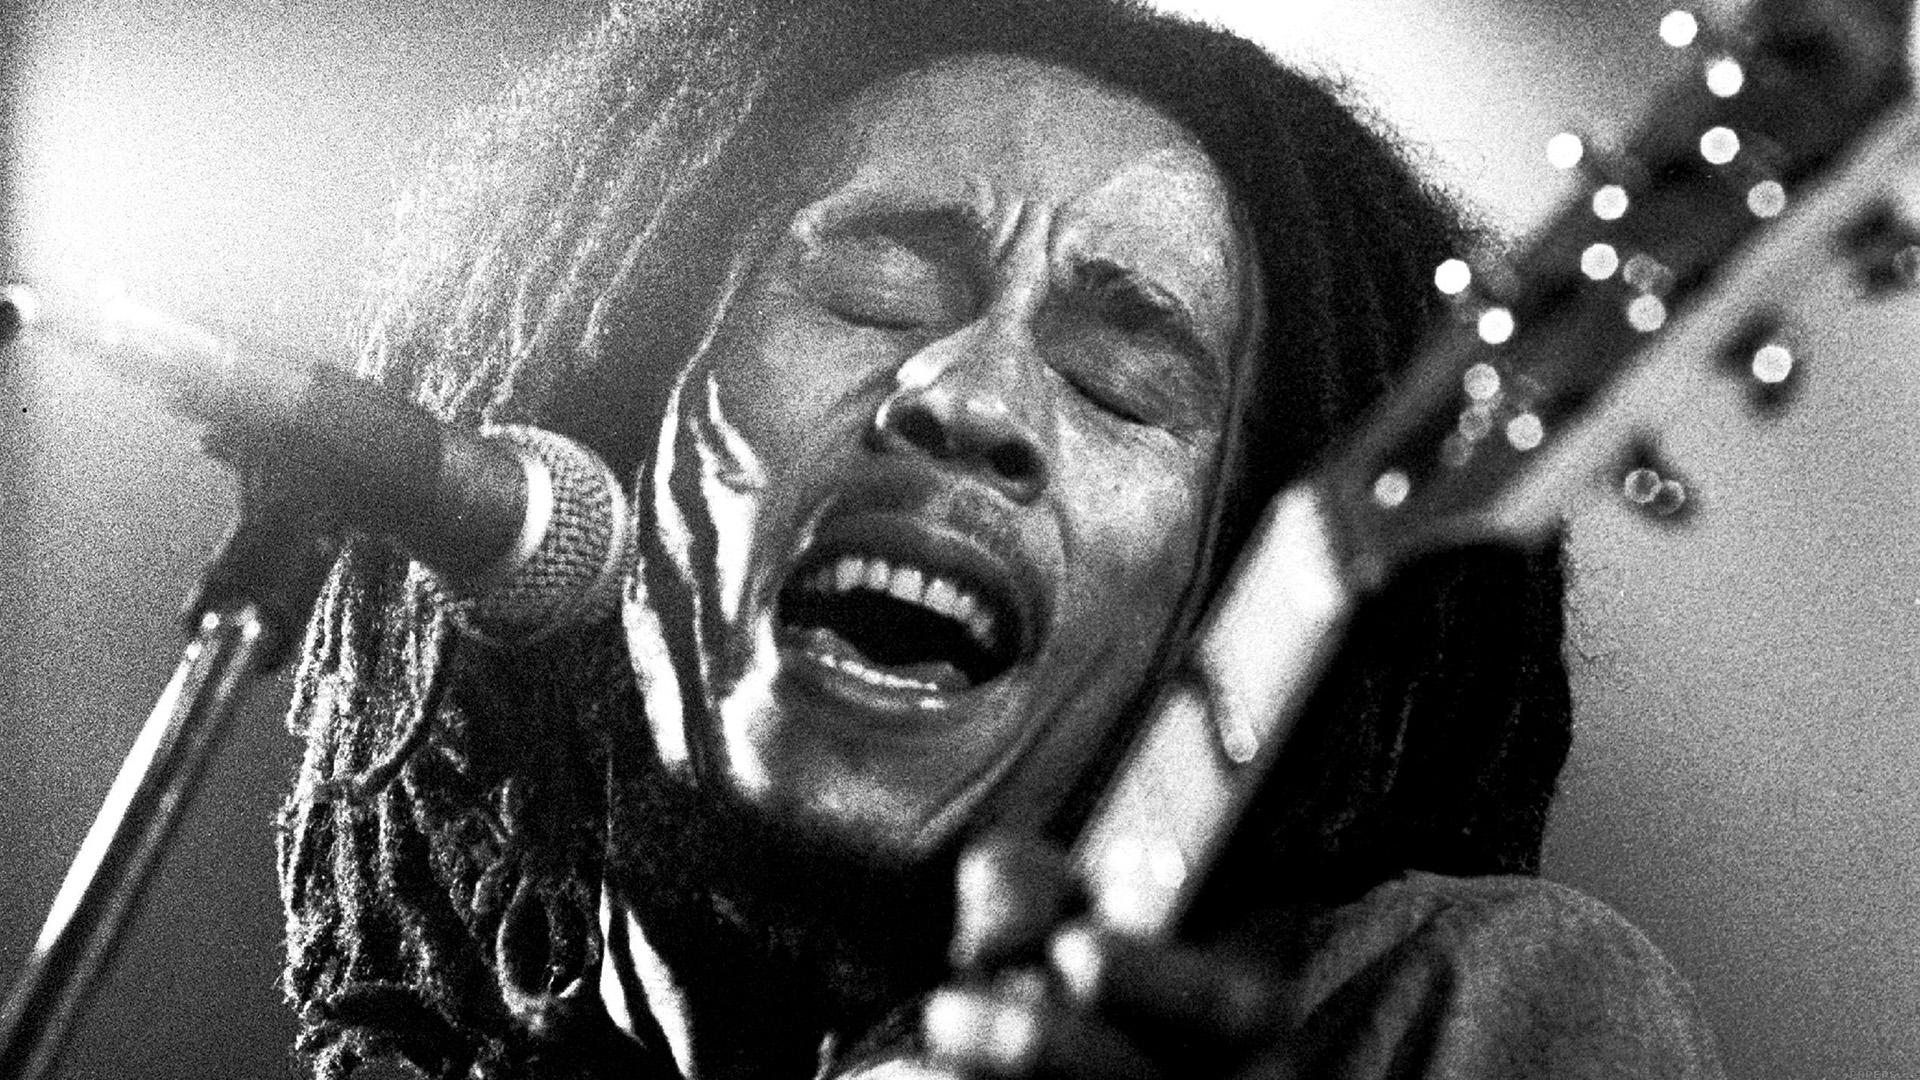 he16-bob-marley-dark-art-illust-music-reggae-celebrity ...